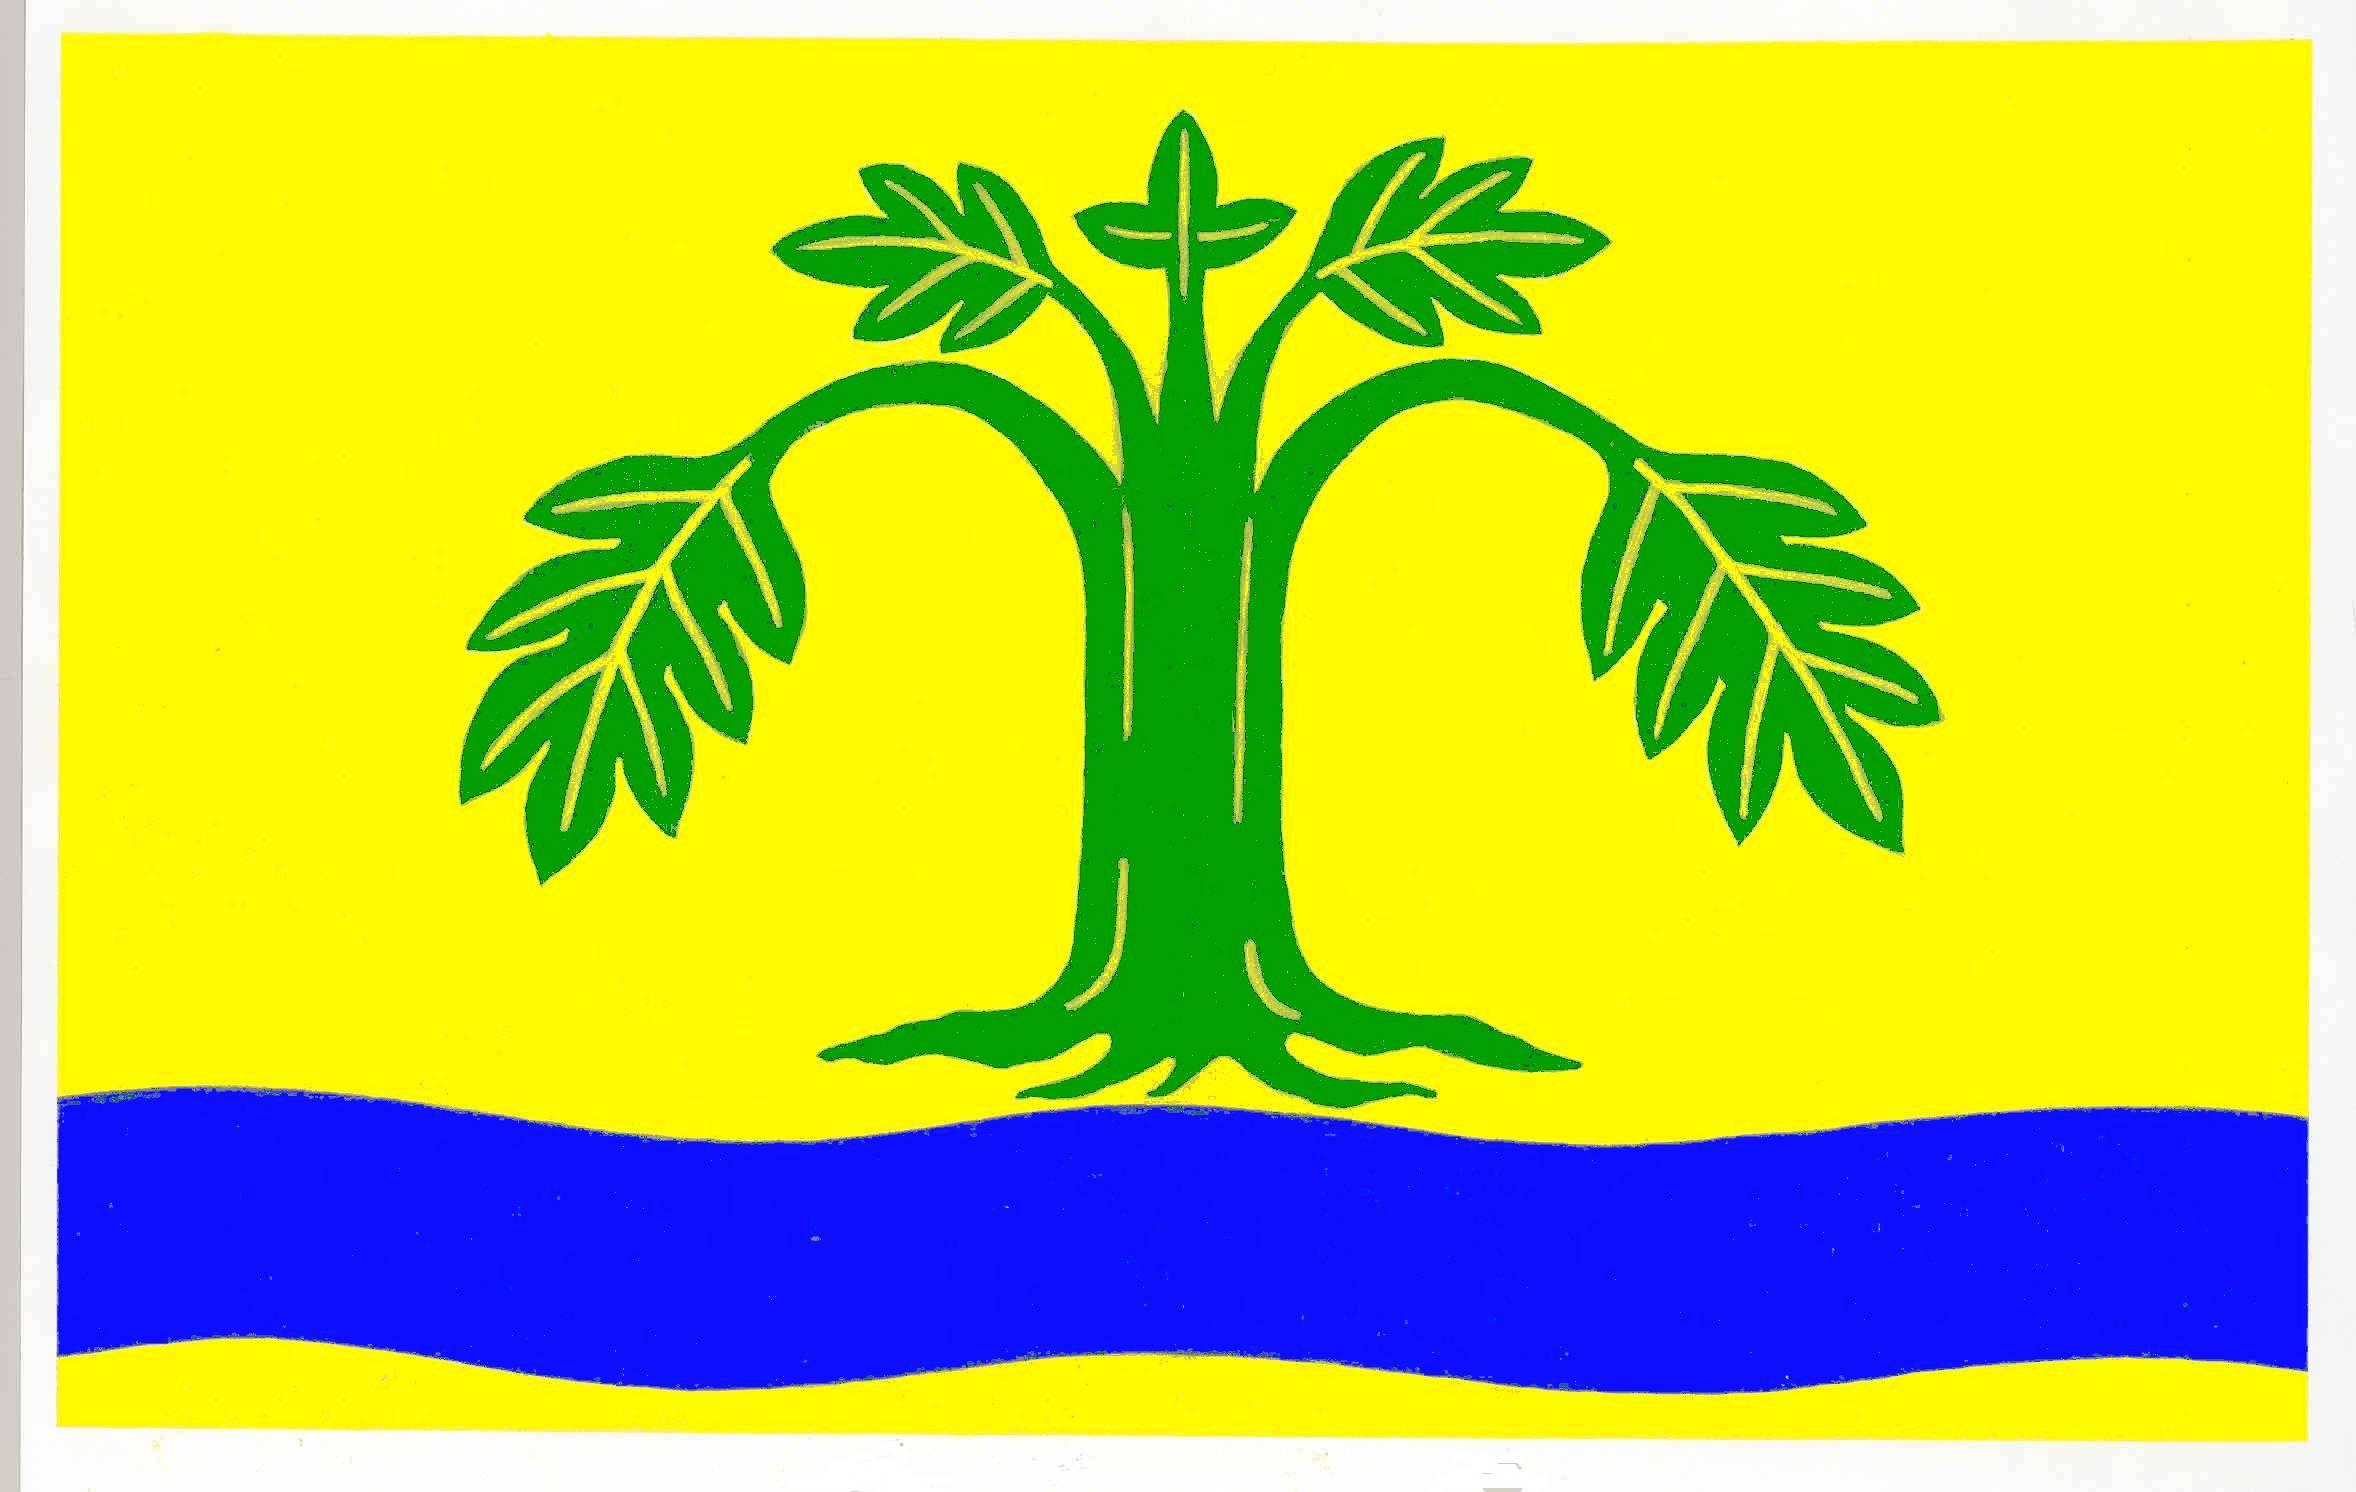 Flagge GemeindeGrube, Kreis Ostholstein